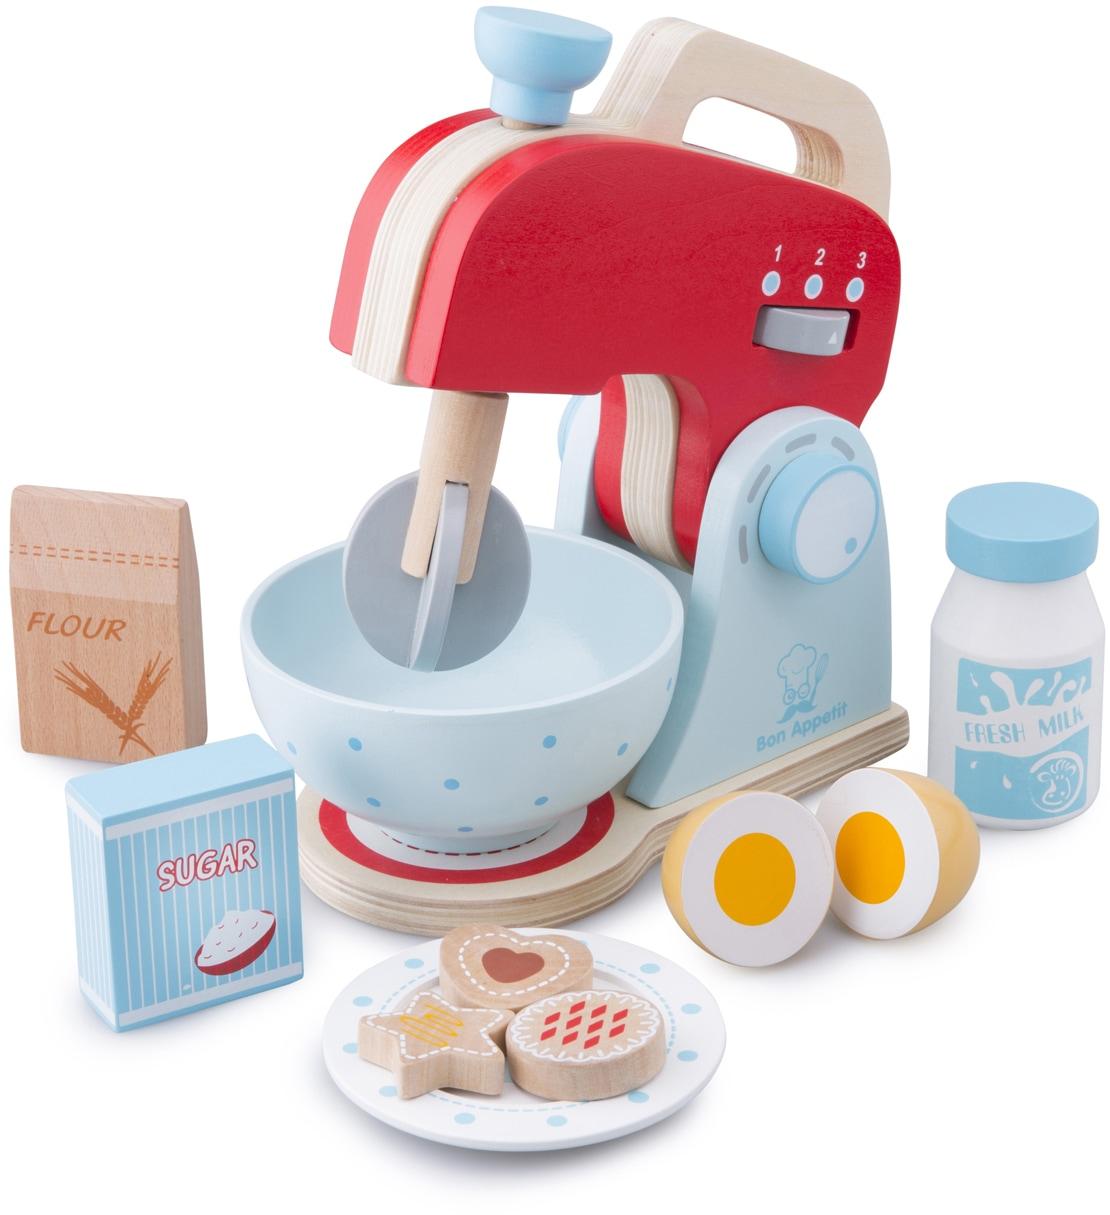 New Classic Toys Kinder-Rührgerät Spielzeug-Mixer bunt Kinder Kinder-Haushaltsgeräte Zubehör Kaufladen Kinderküchen Spielzeug-Haushaltsgeräte